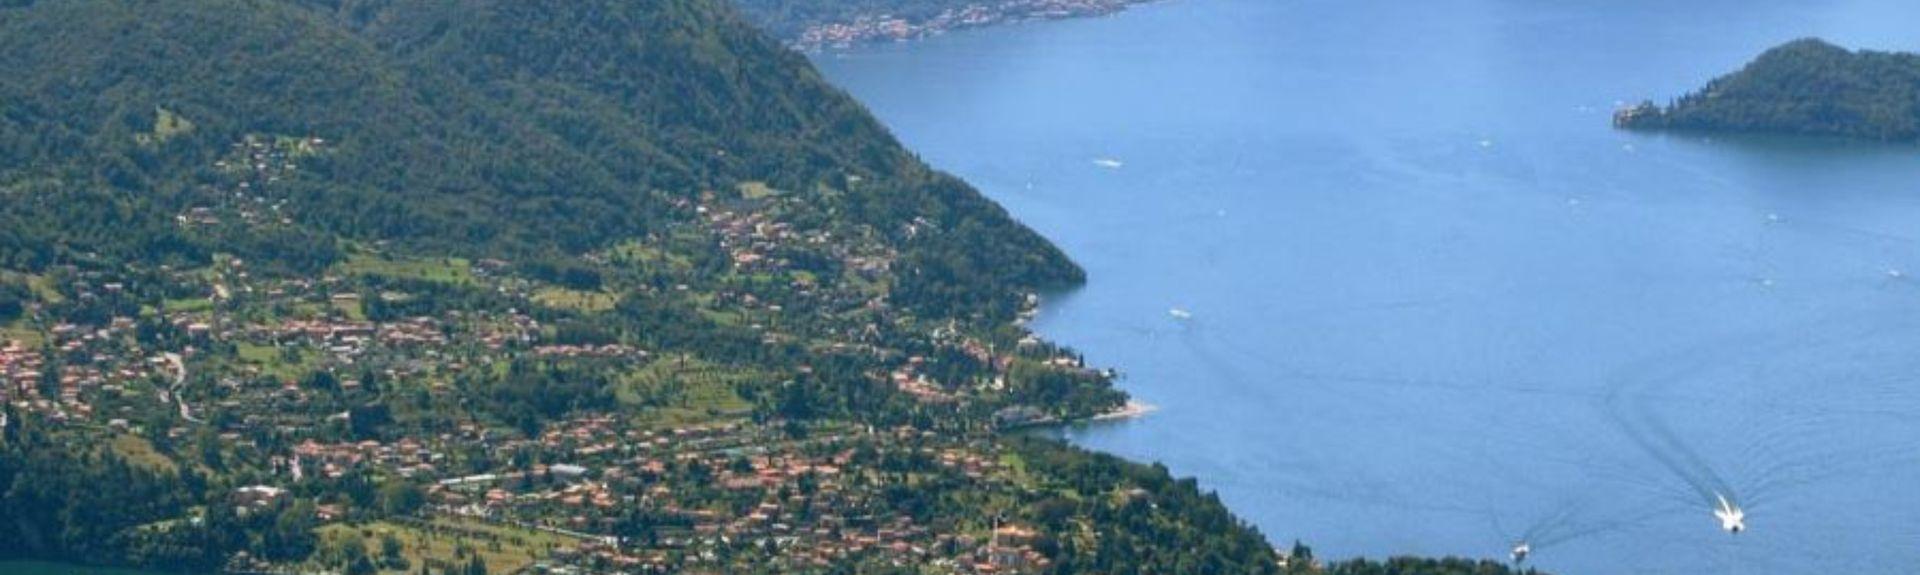 Carlazzo, Lombardije, Italië